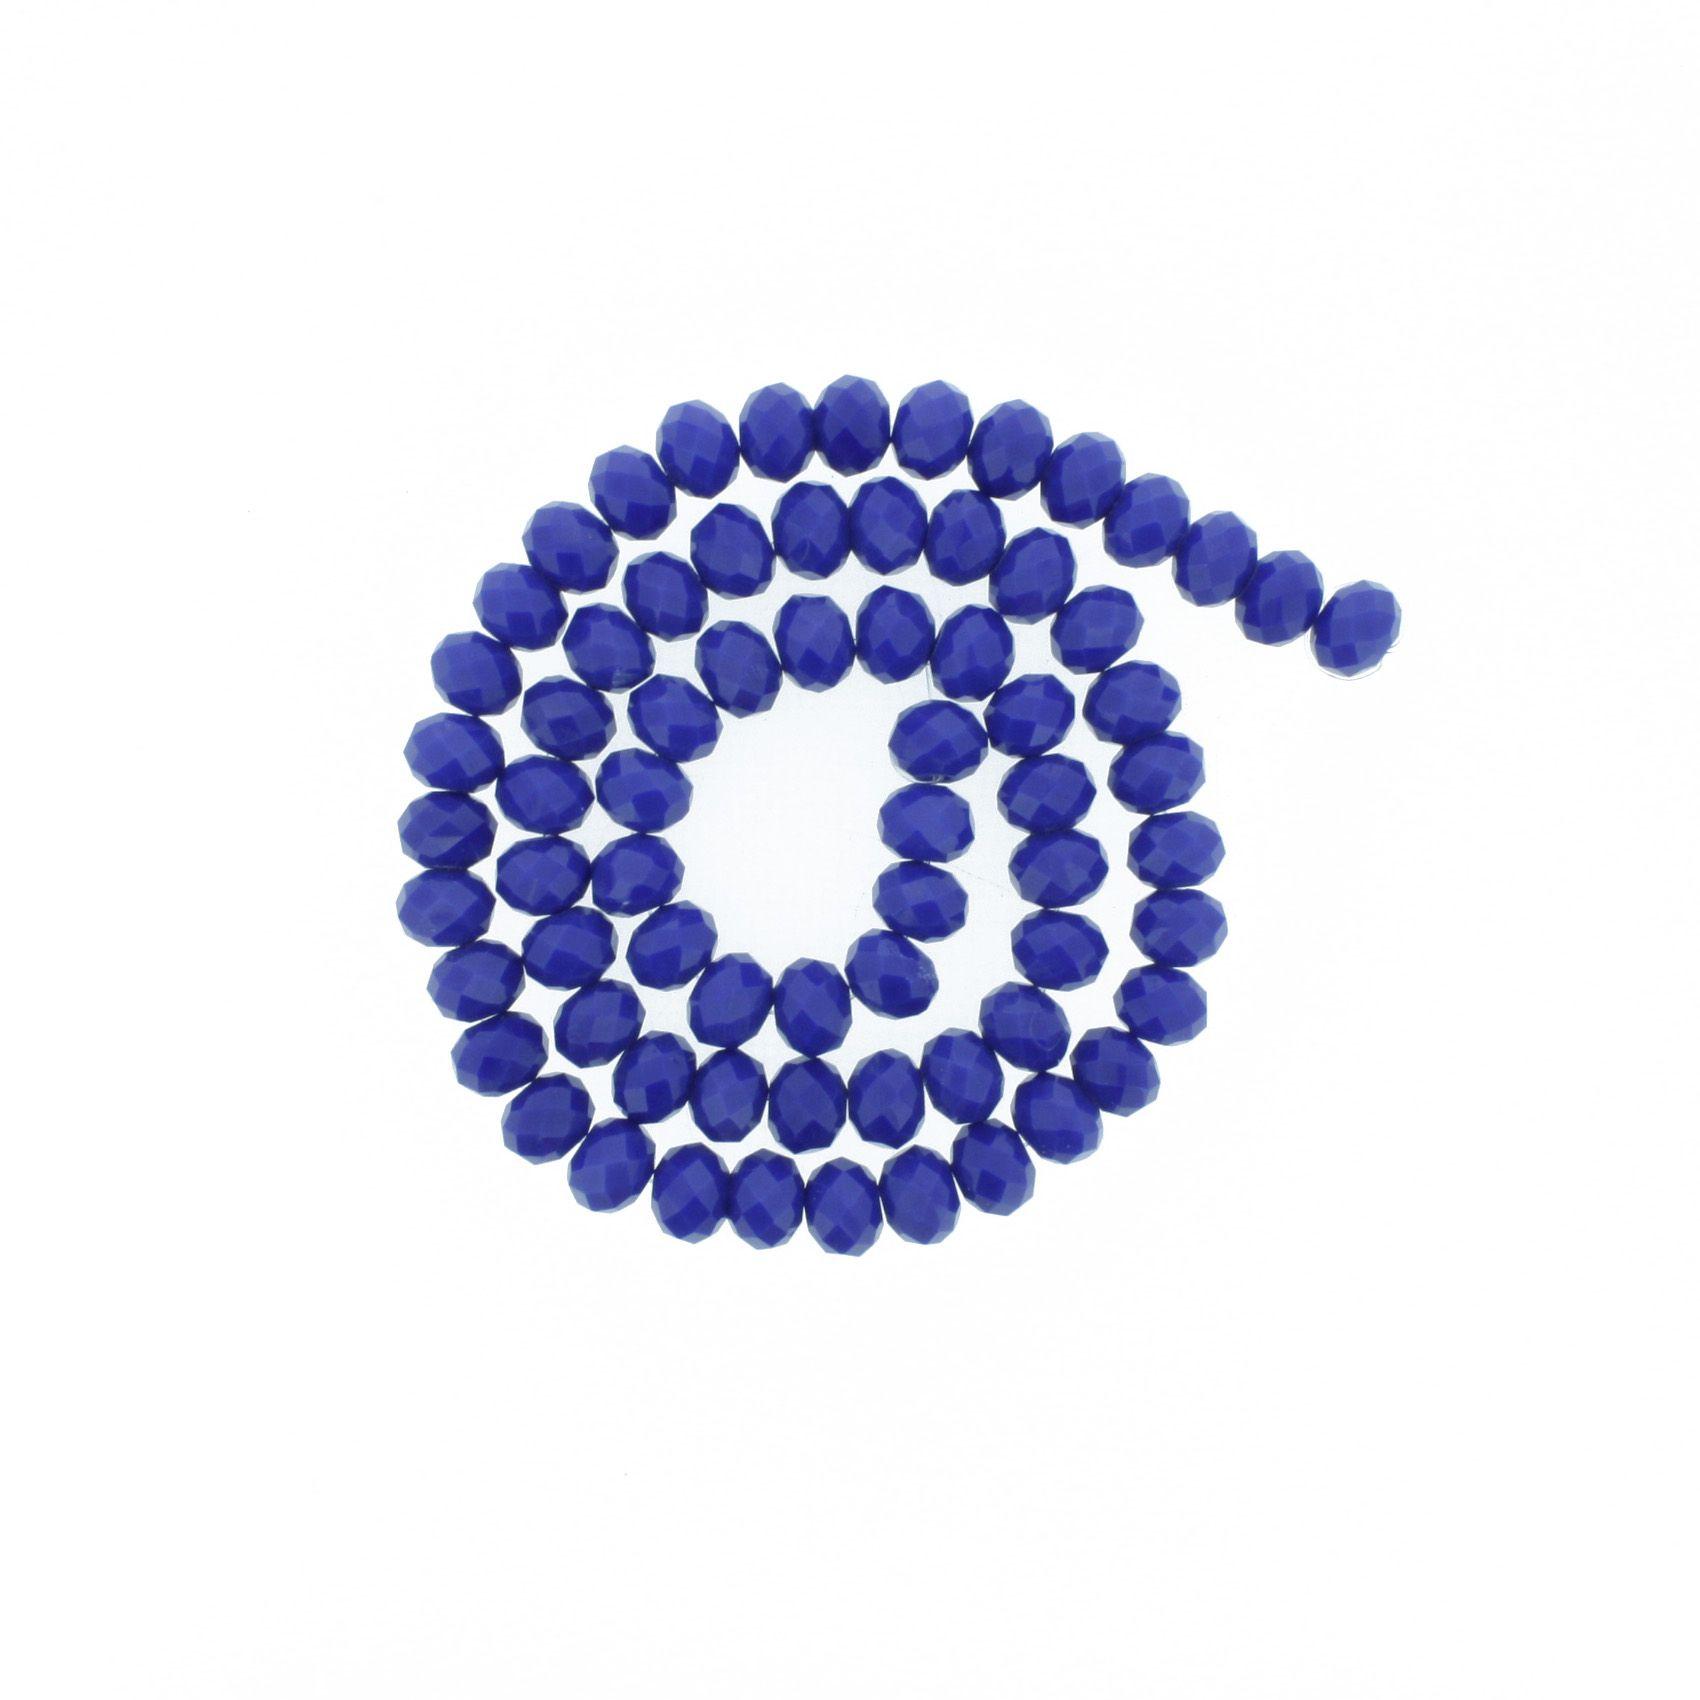 Fio de Cristal - Piatto® - Azul Royal - 8mm  - Universo Religioso® - Artigos de Umbanda e Candomblé